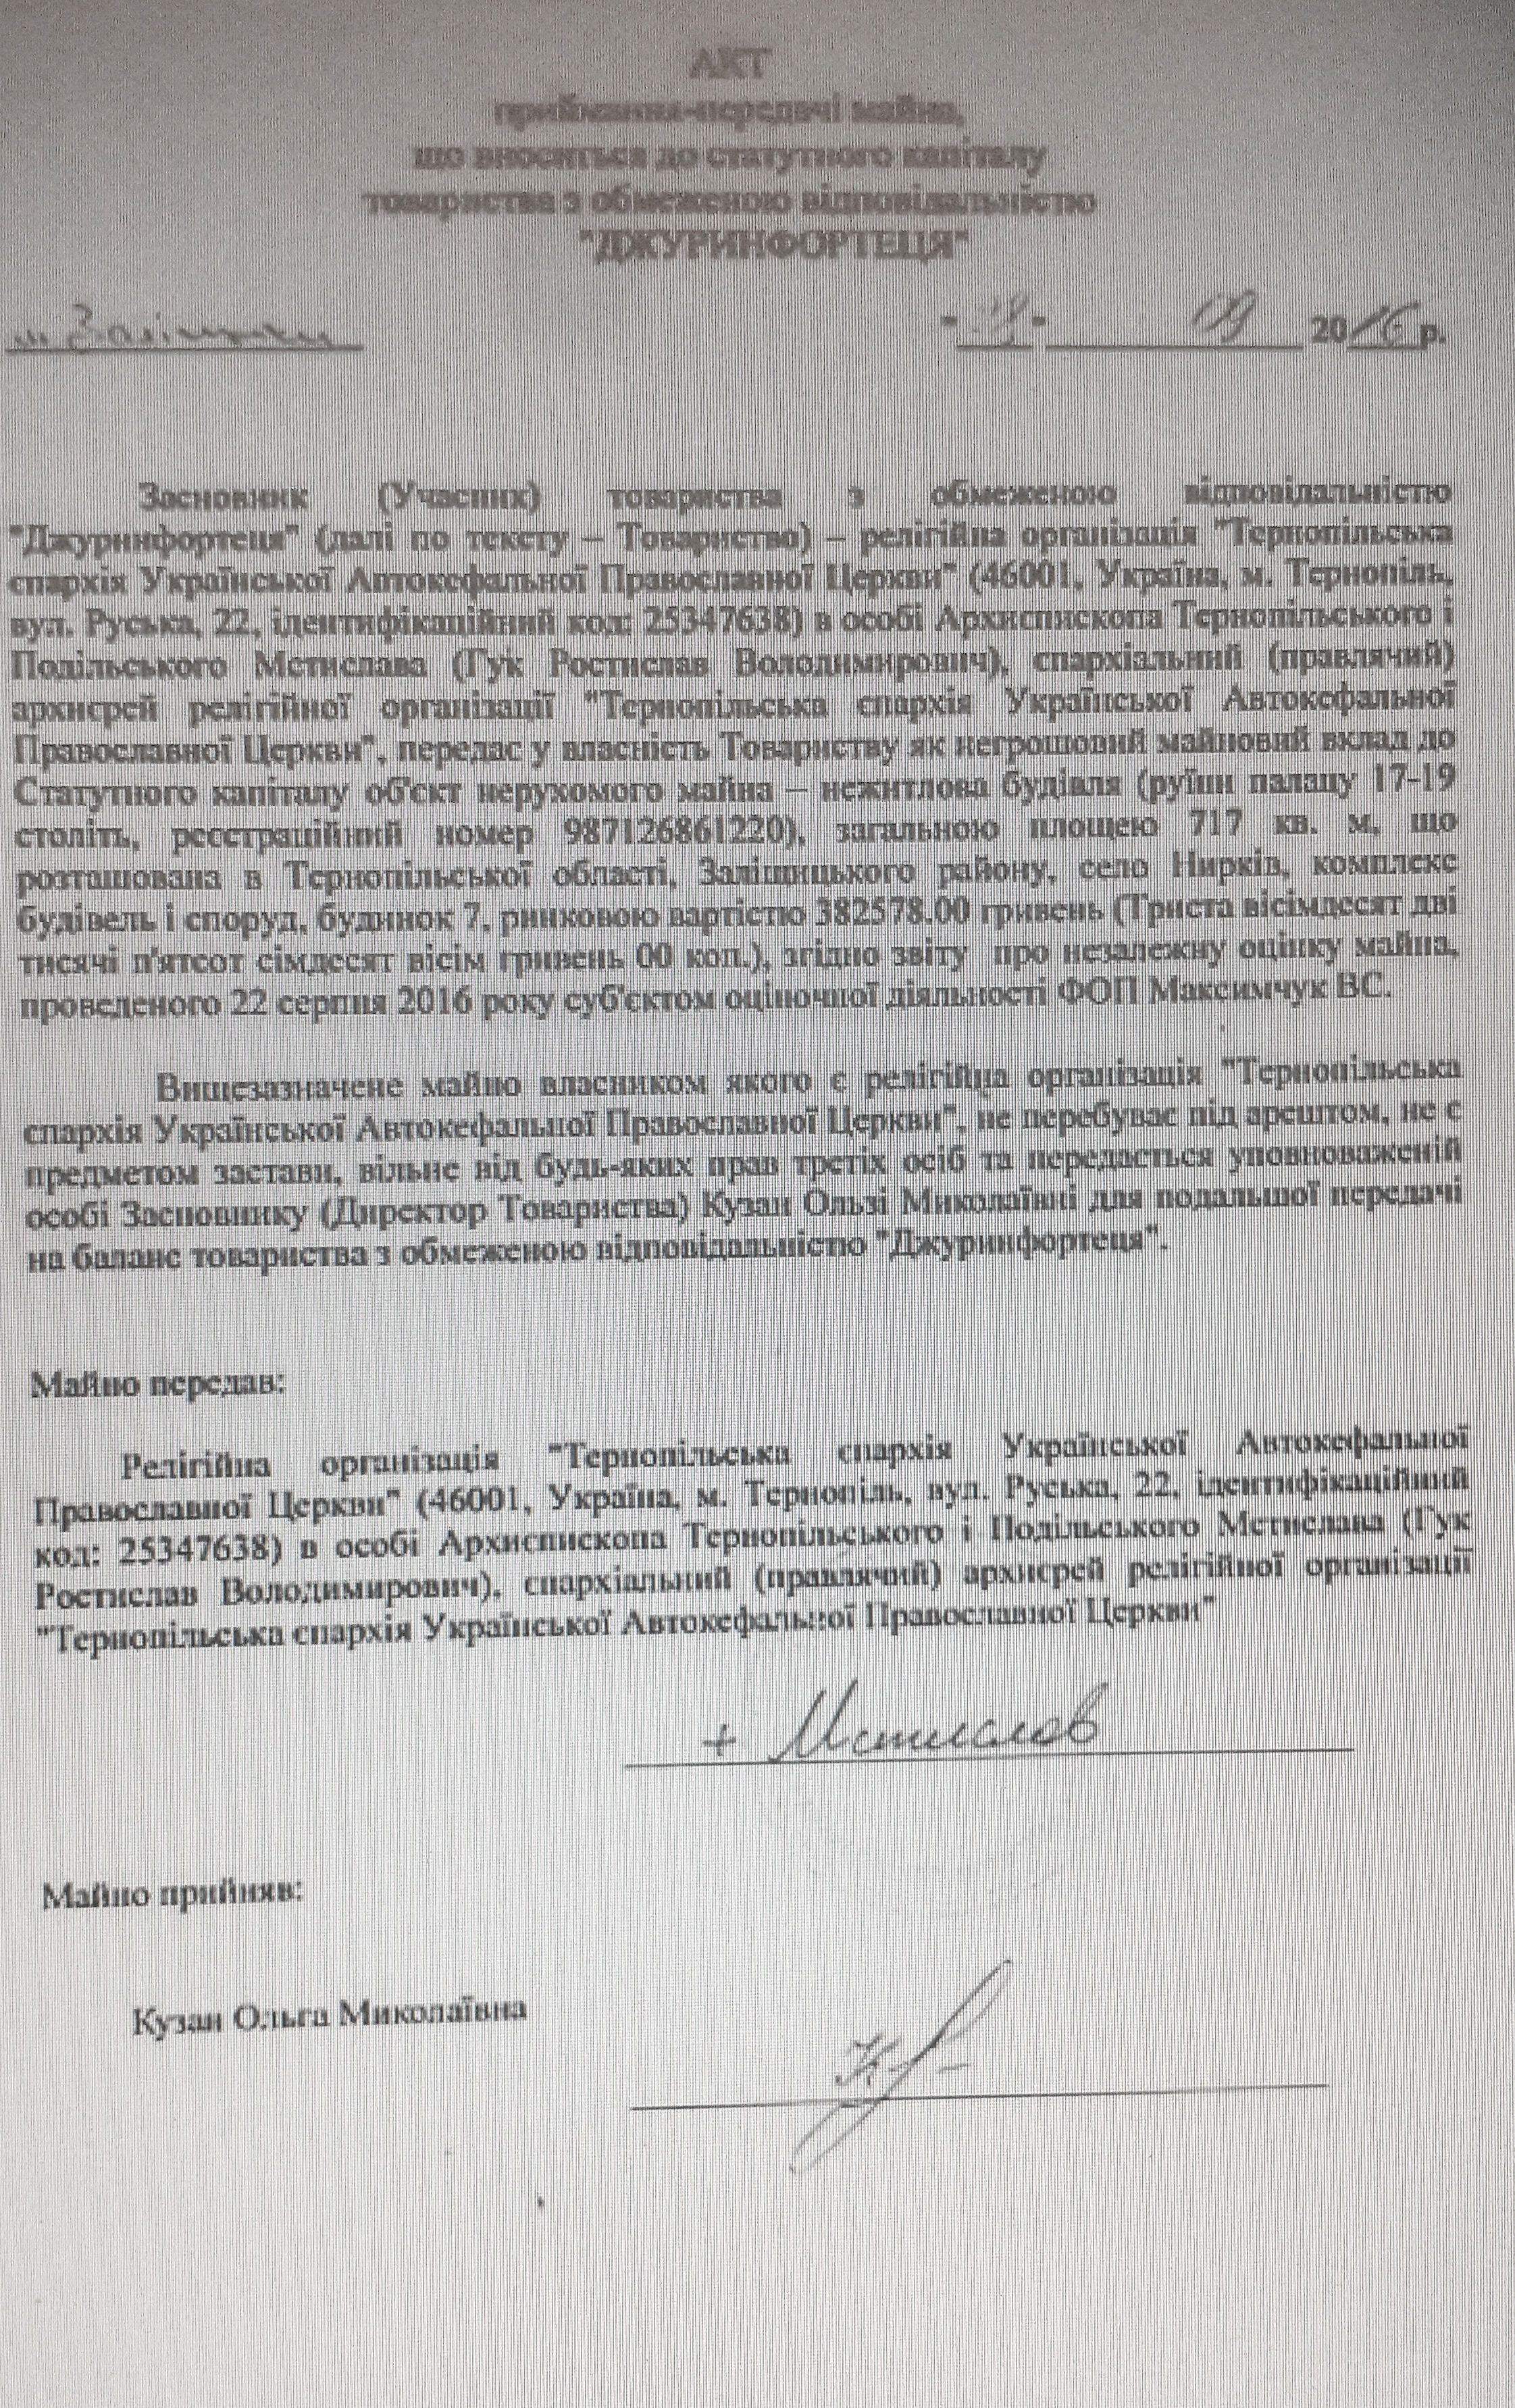 Документи по священику Мстиславу_9